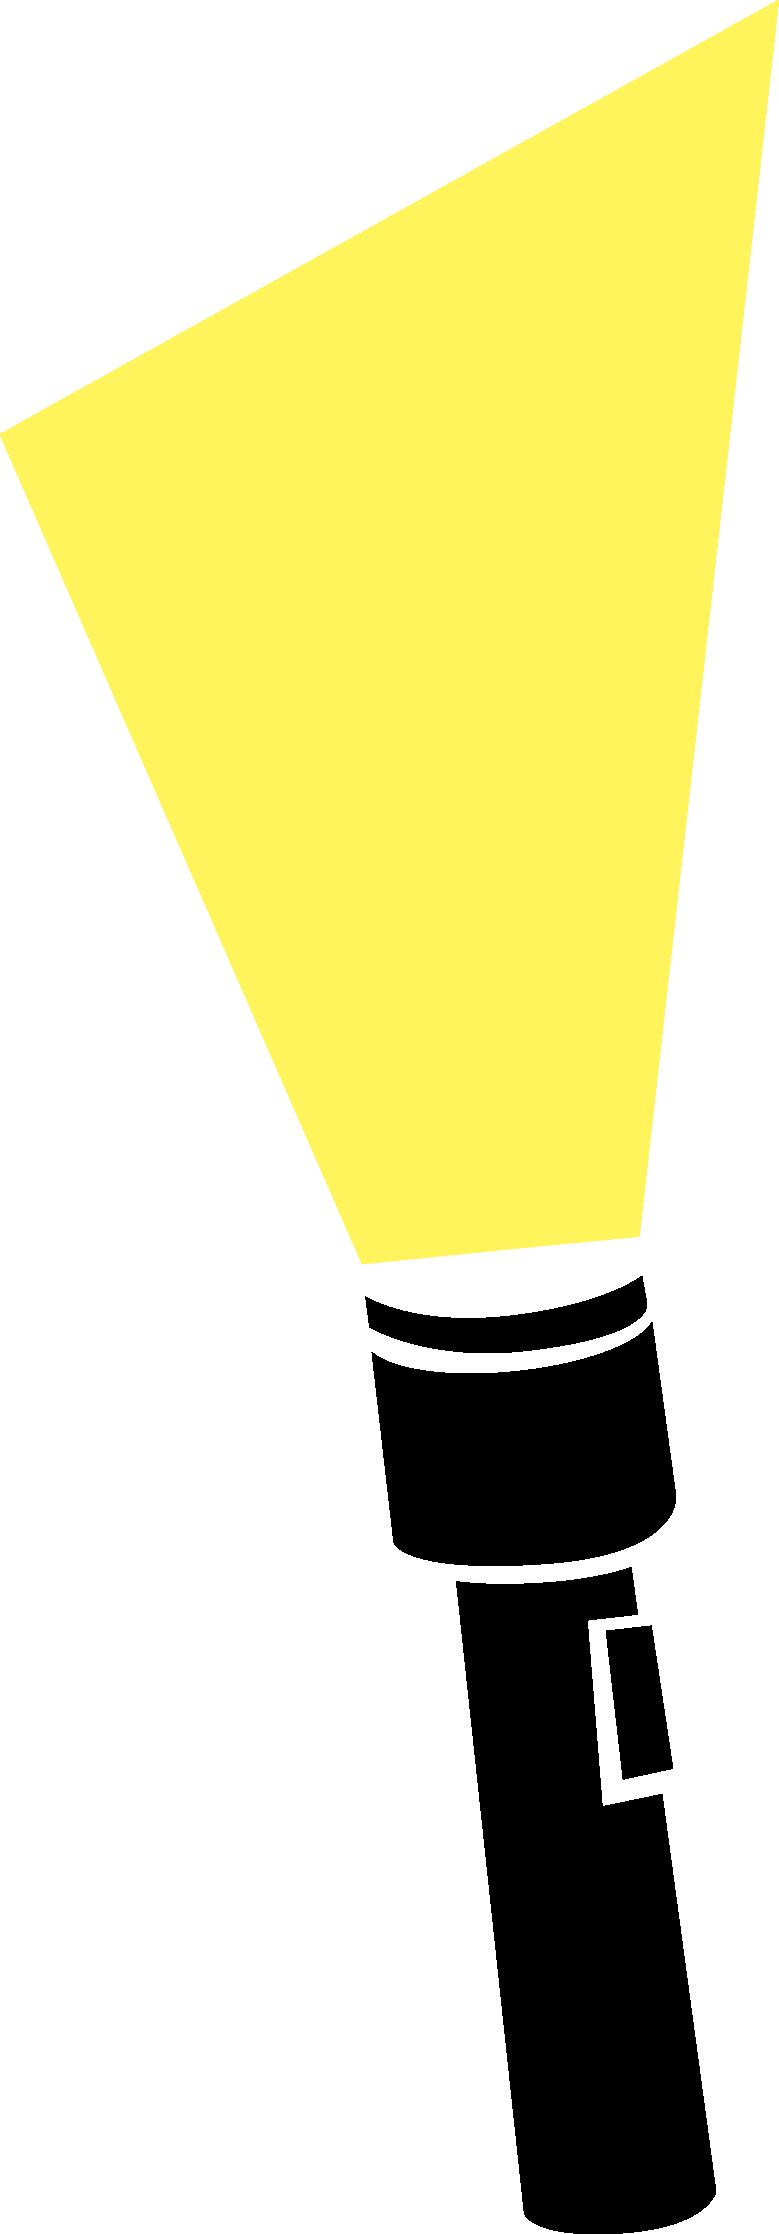 Flashlight merry clip art image